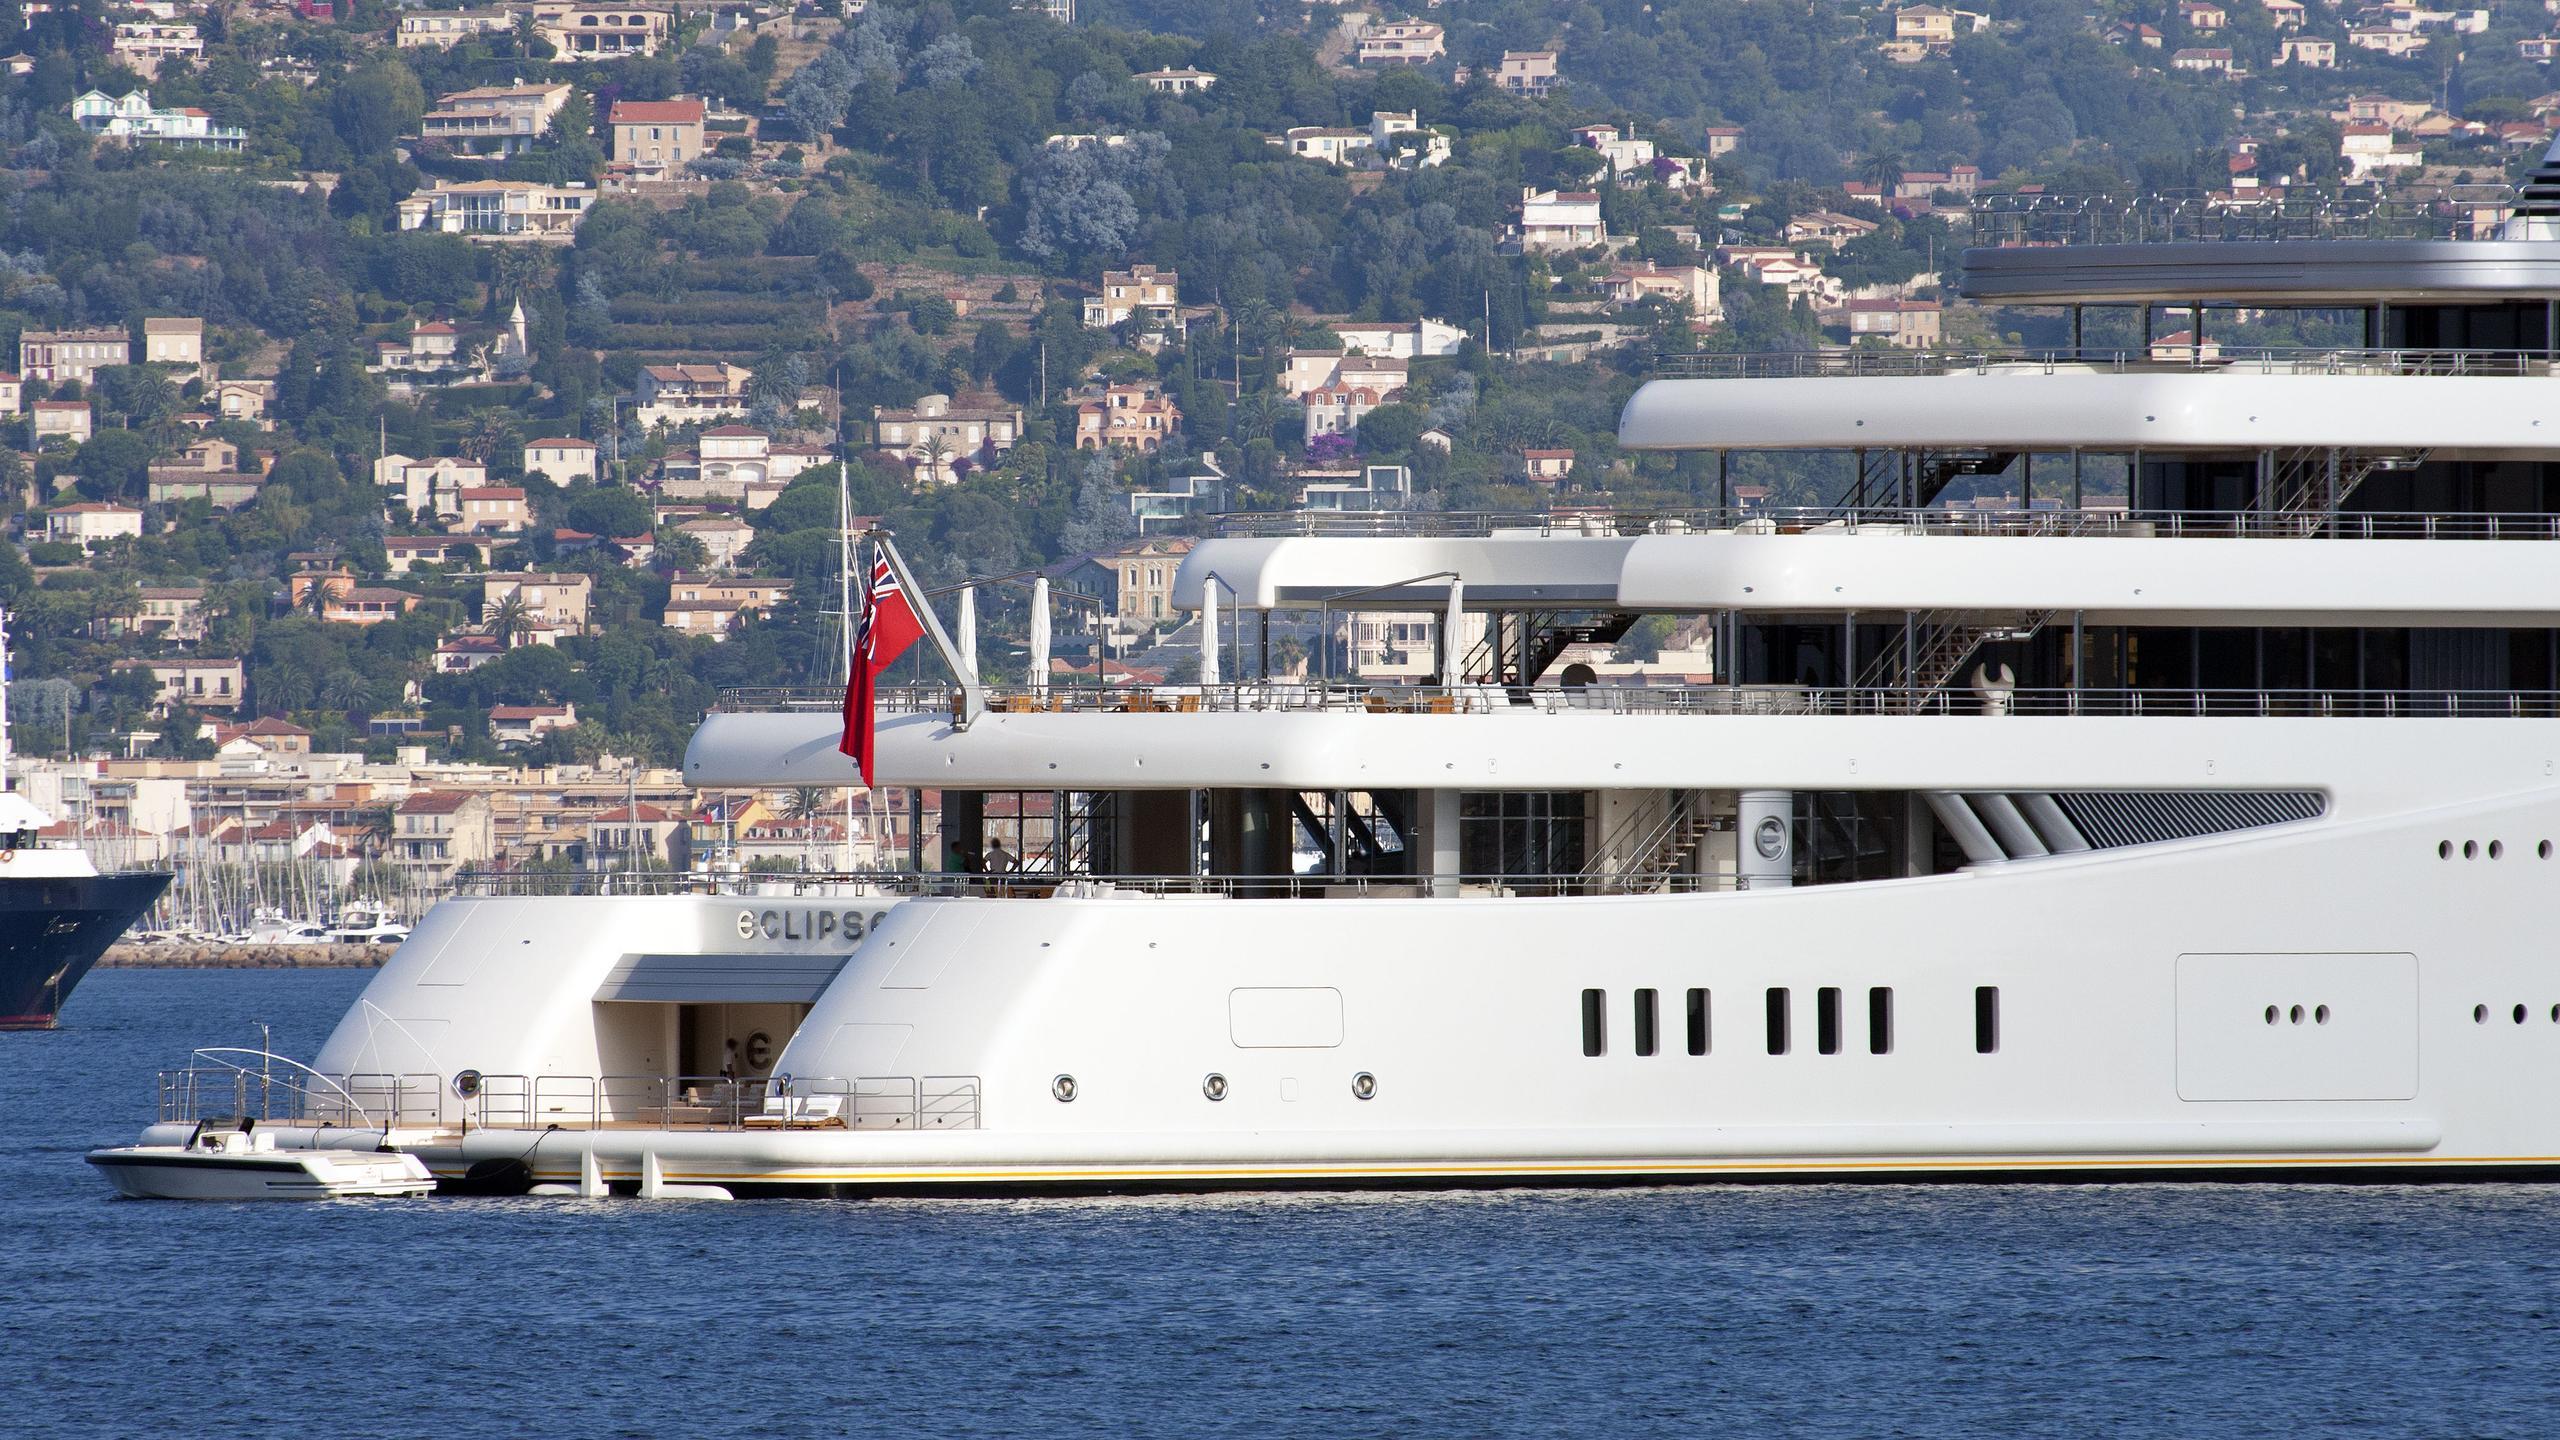 eclipse-motor-yacht-blohm-voss-2010-162m-stern-details-details